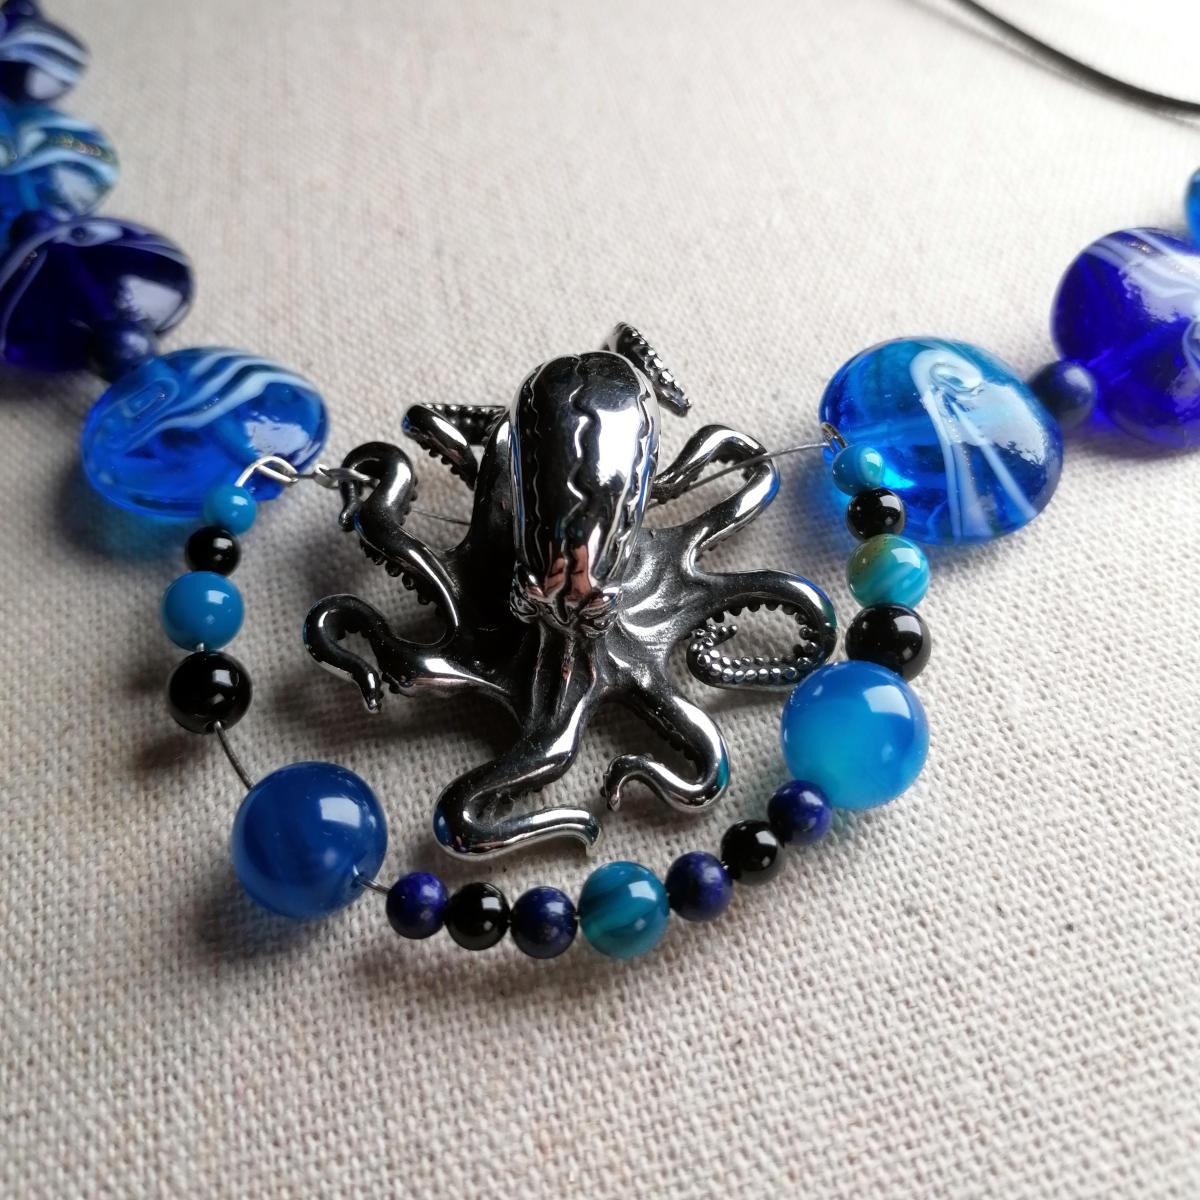 Octoblue - asymmetric collier in blue